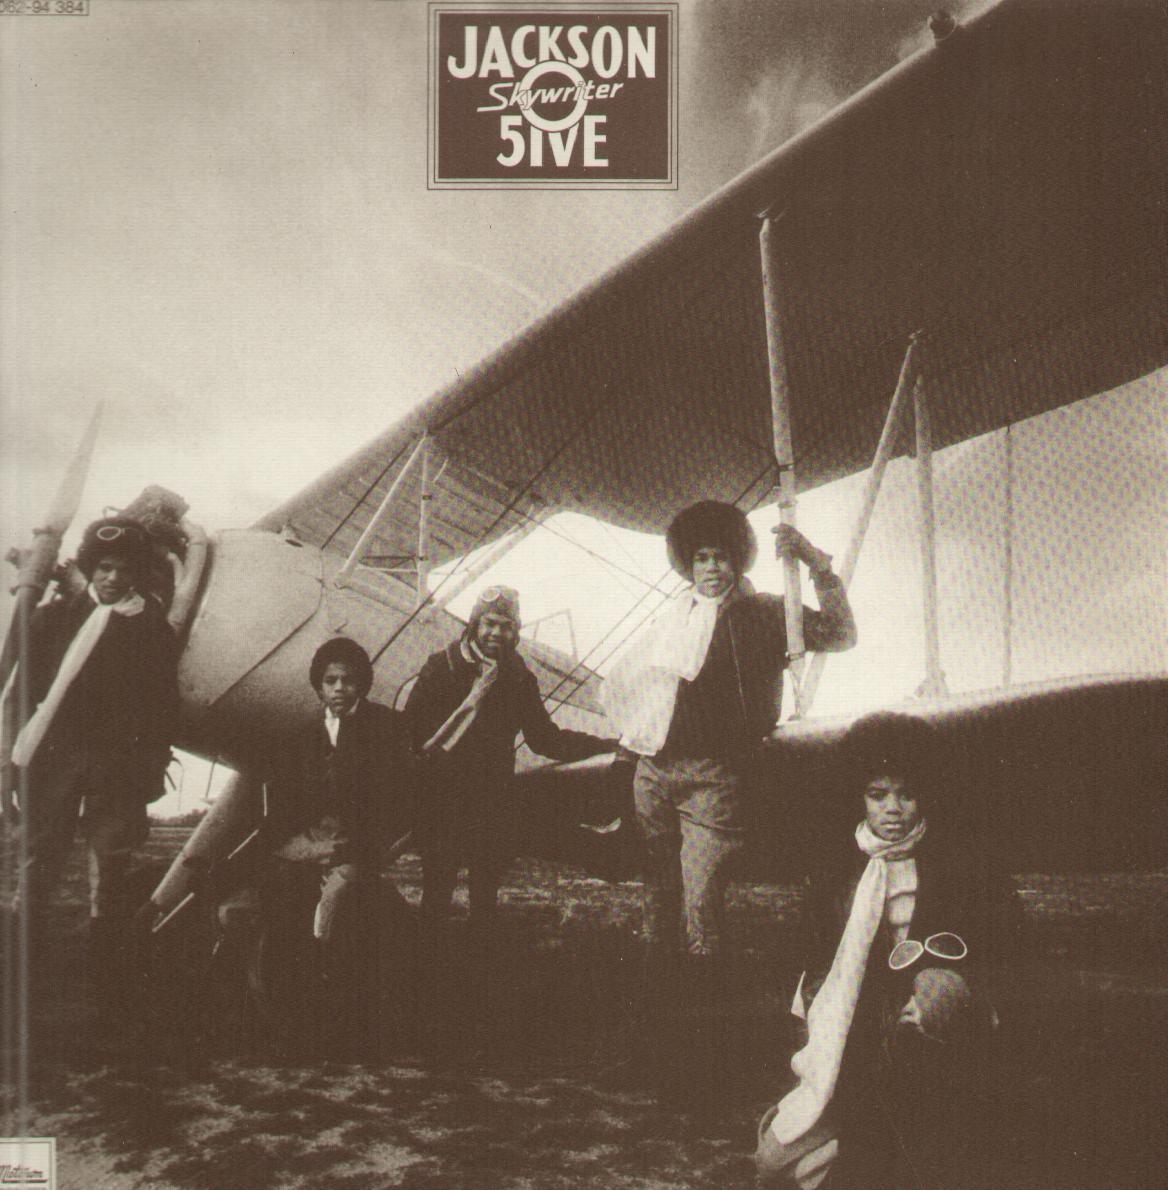 Jackson 5ive Skywriter